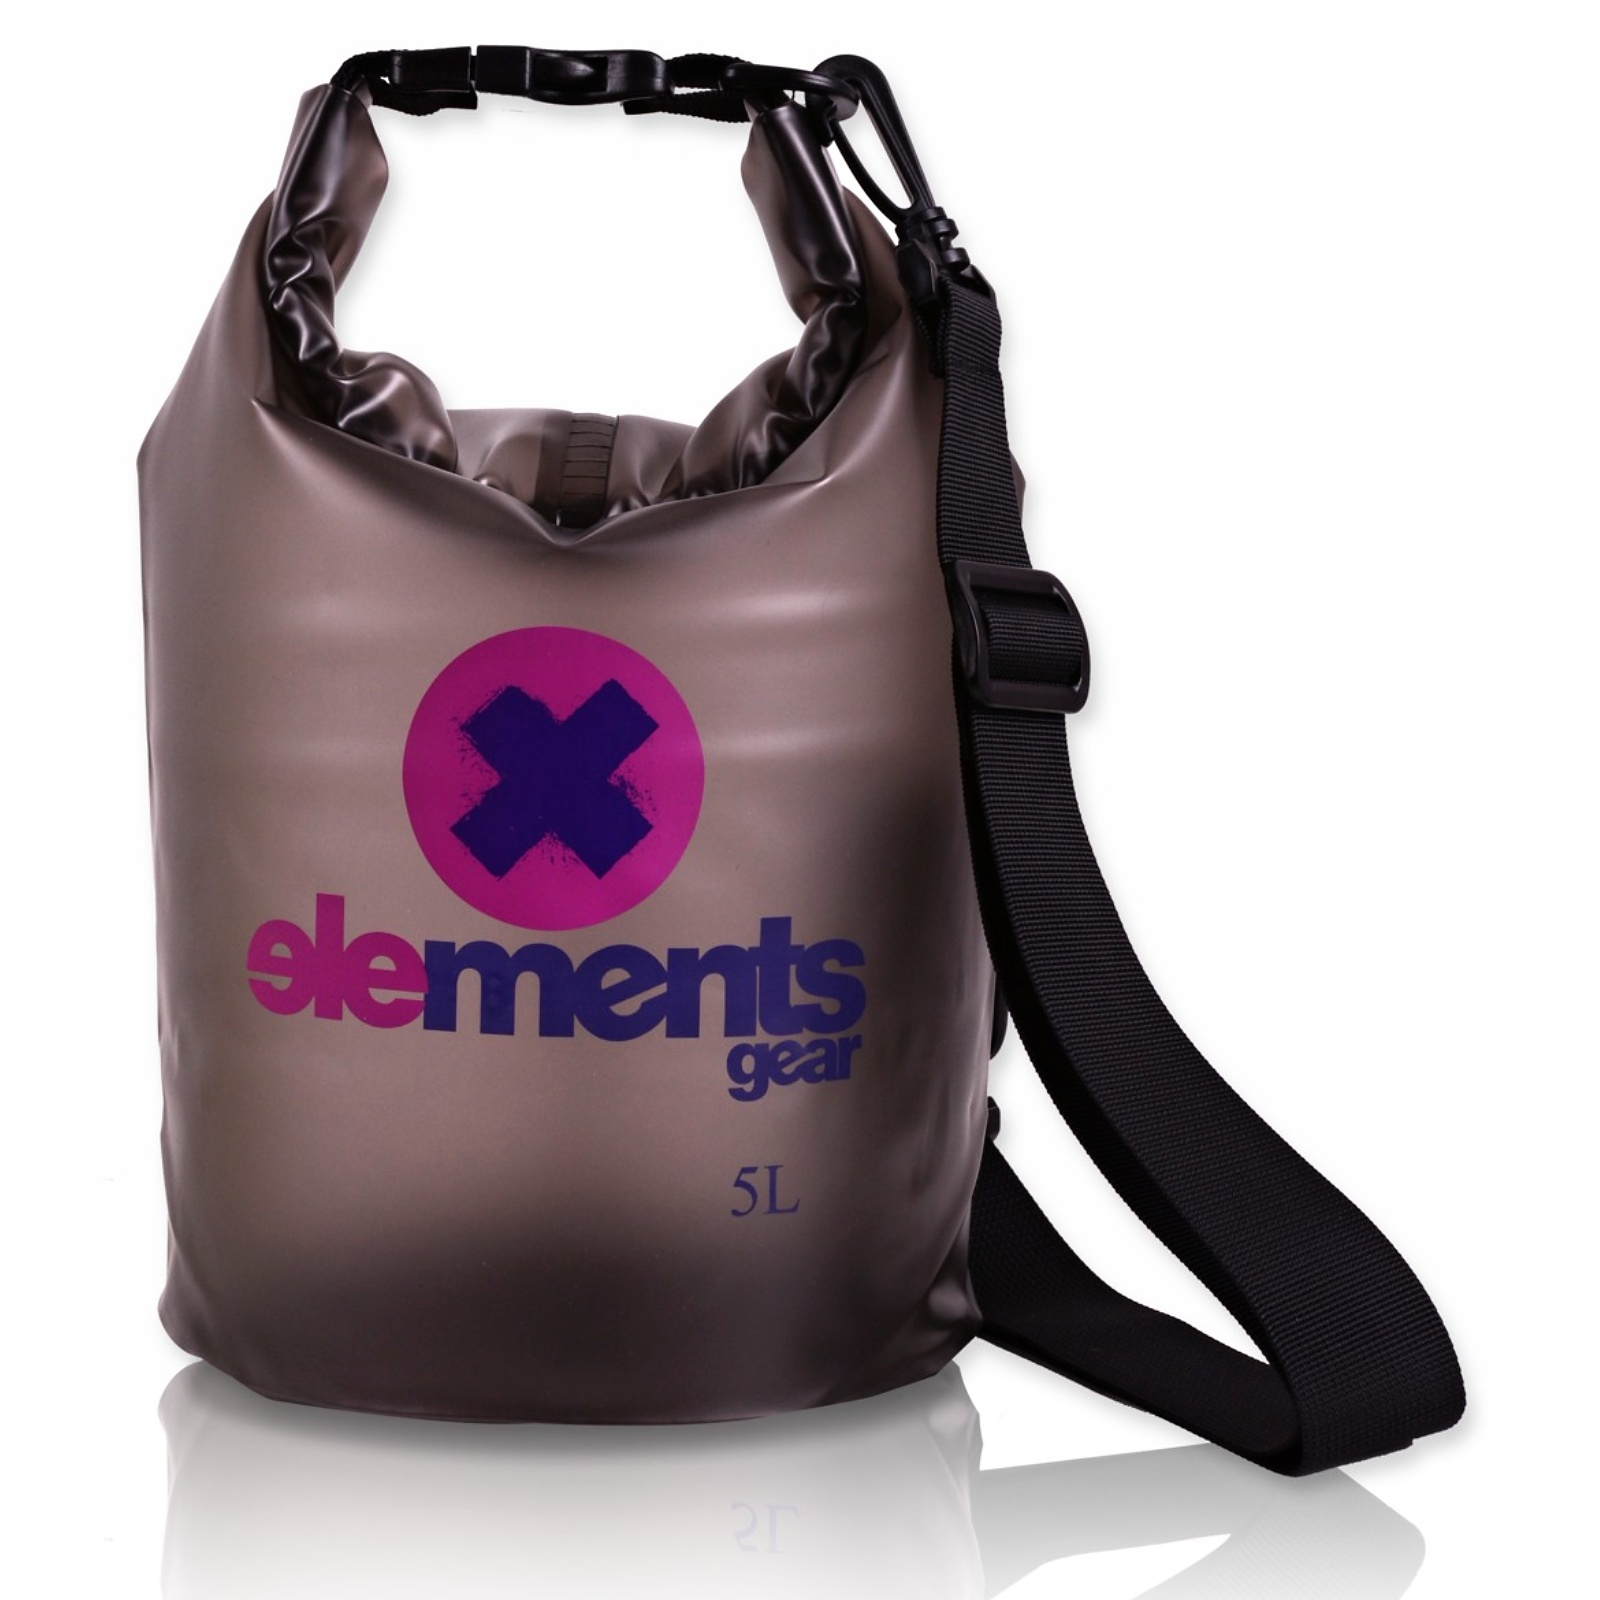 Lodný vak ELEMENTS GEAR Pro 5 L - sivý